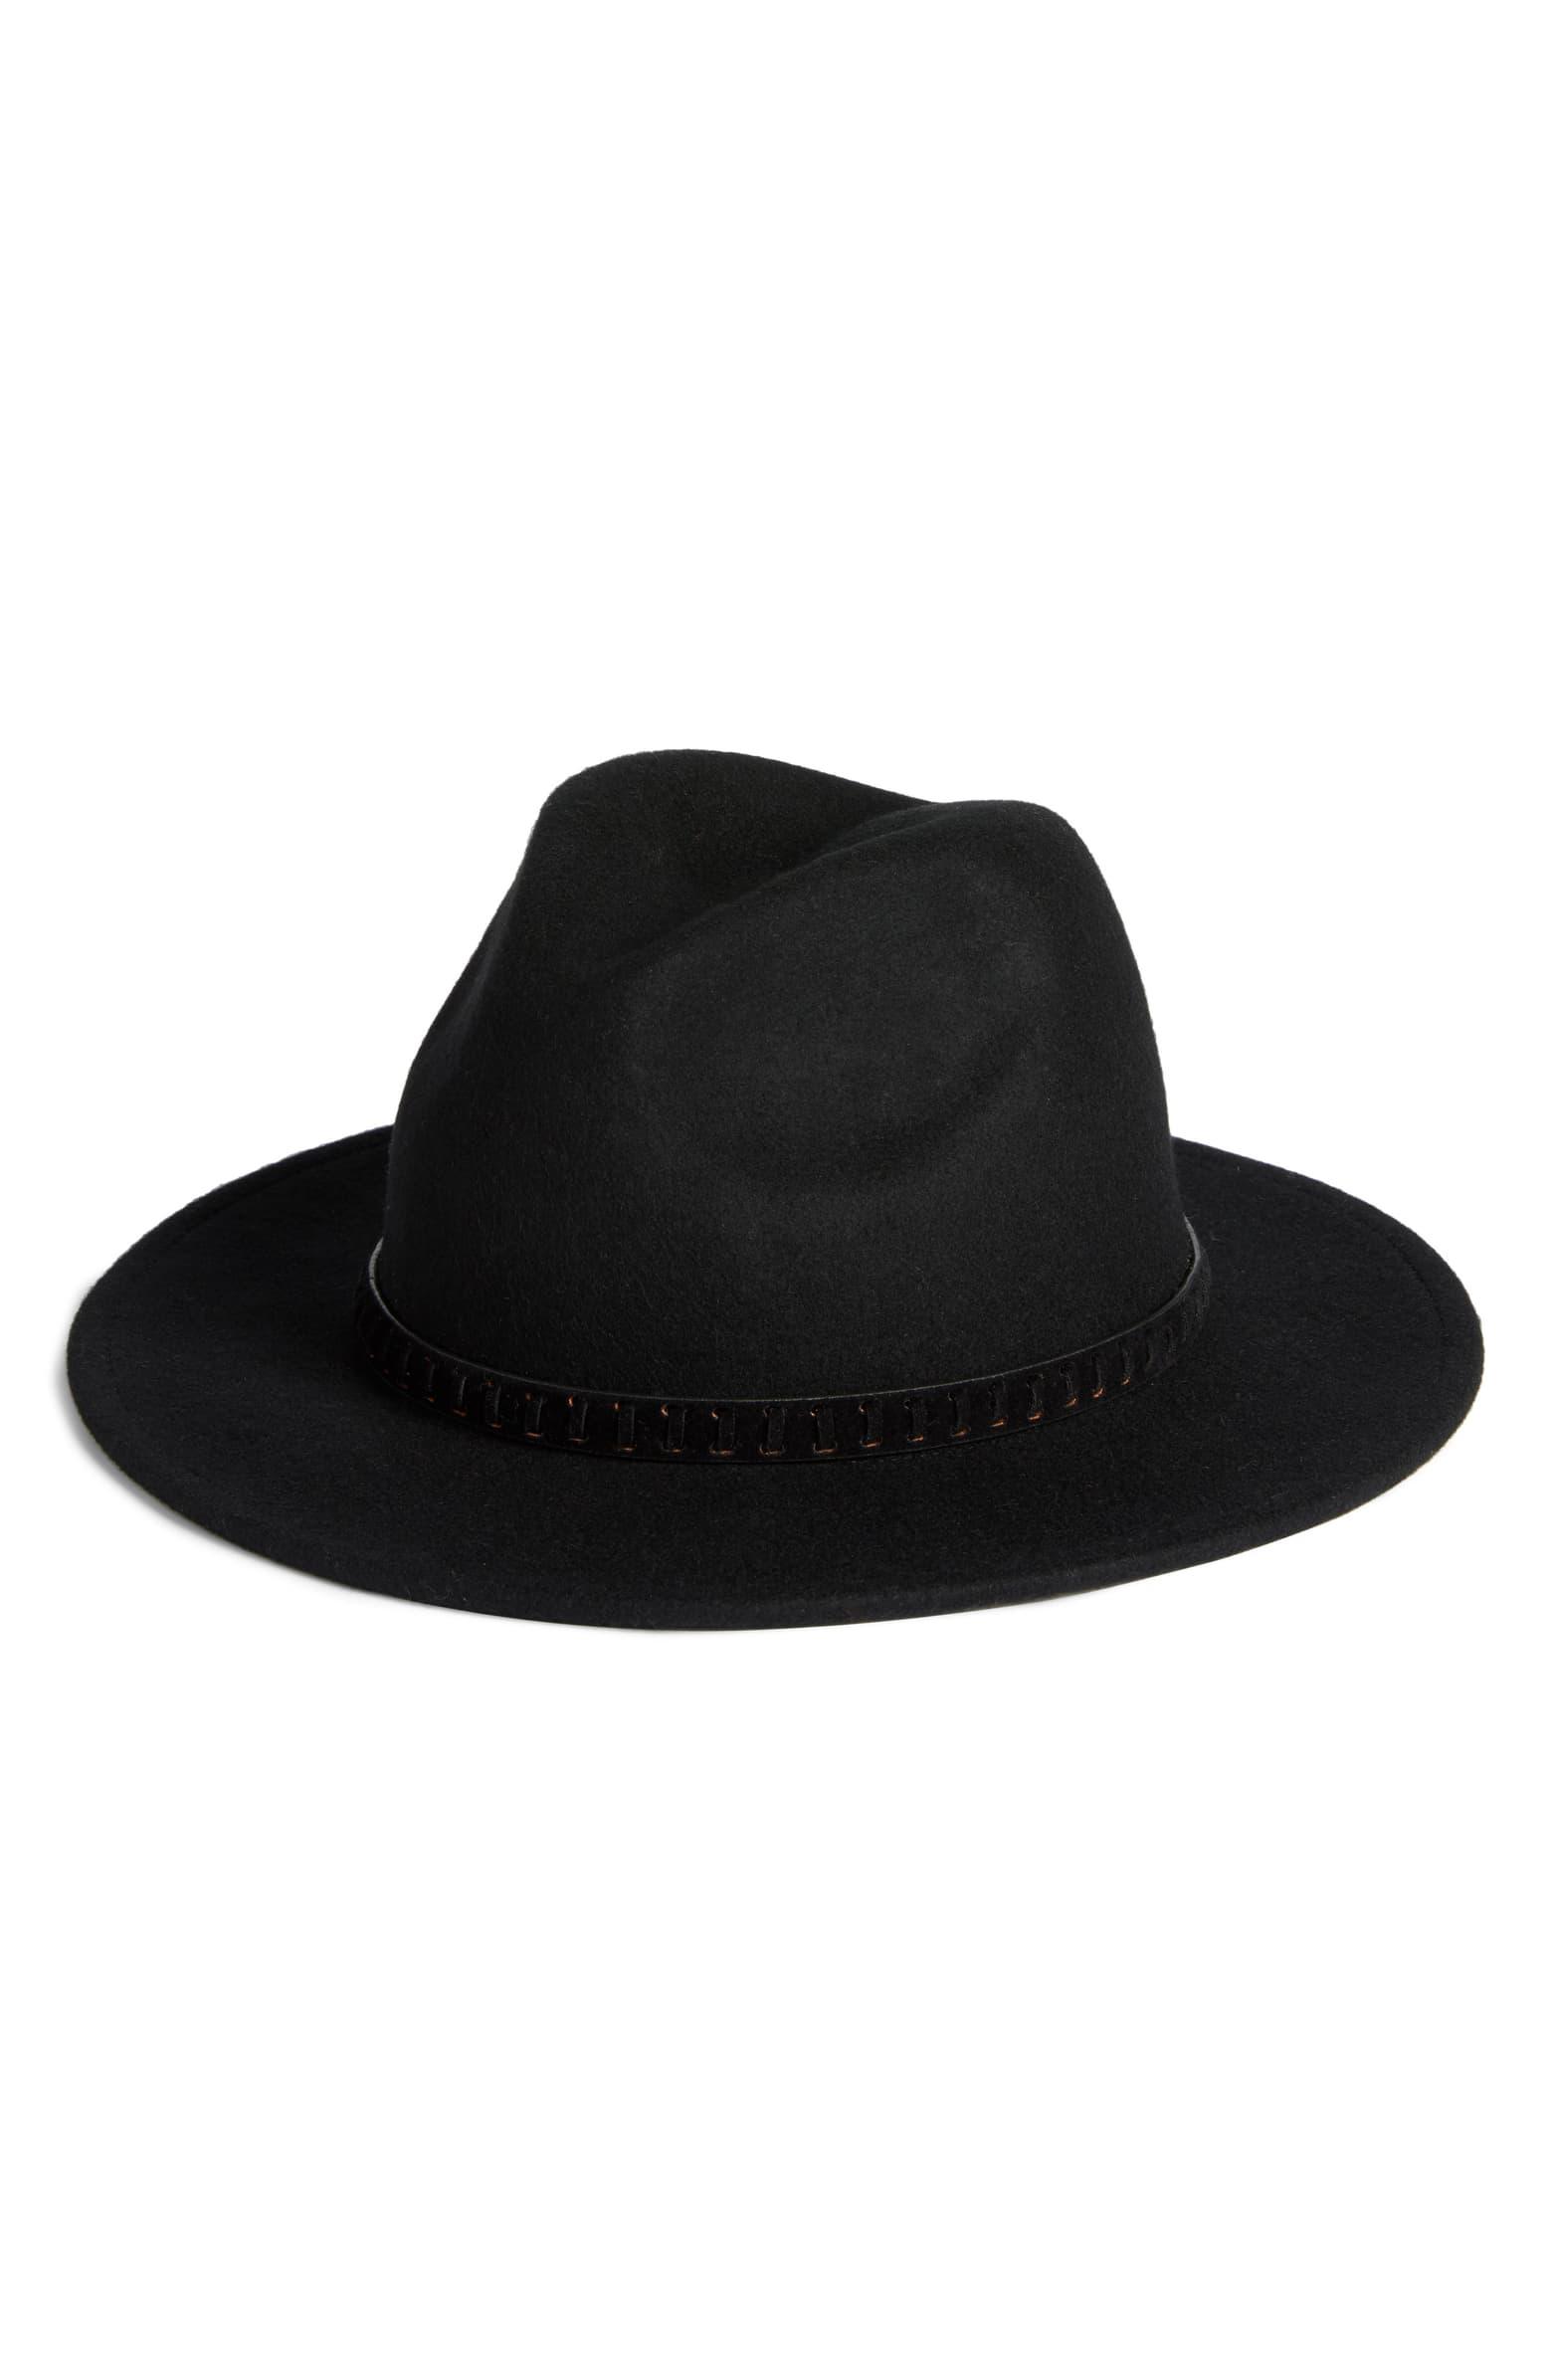 Nordstrom Hat Fall Capsule Wardrobe